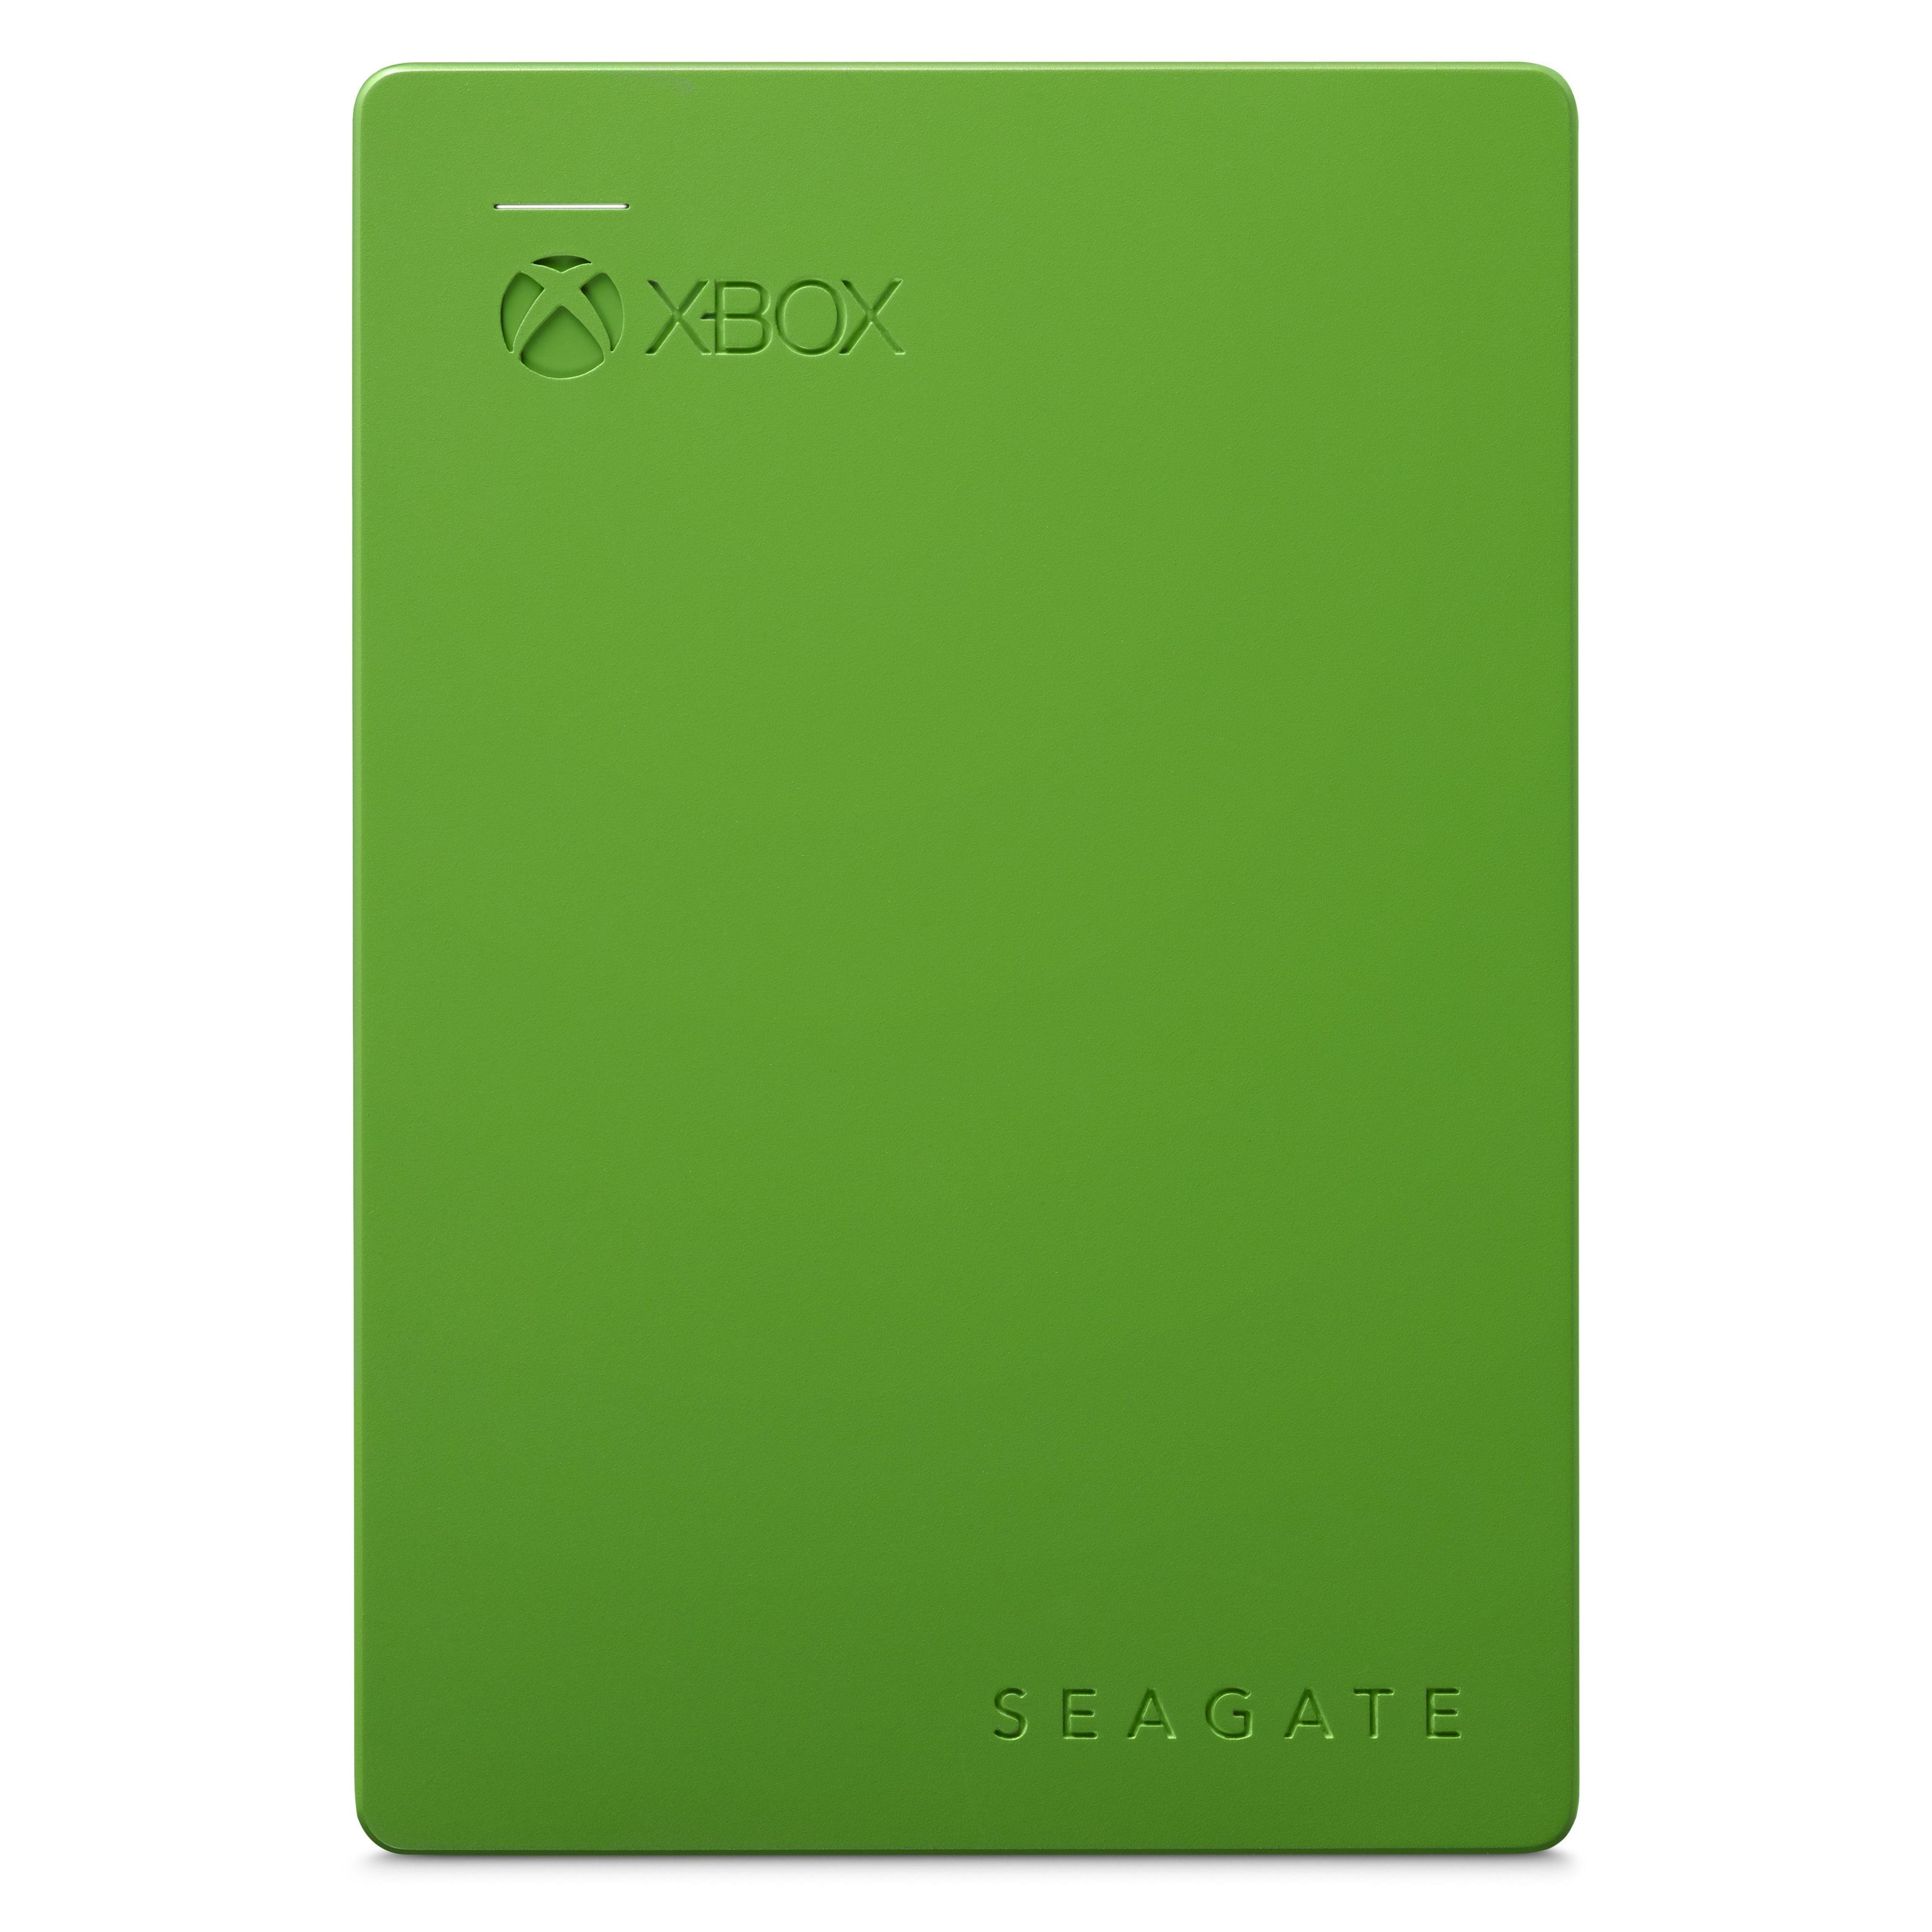 SEAGATE Gaming Festplatte für Xbox (2TB HDD) »STEA2000403«